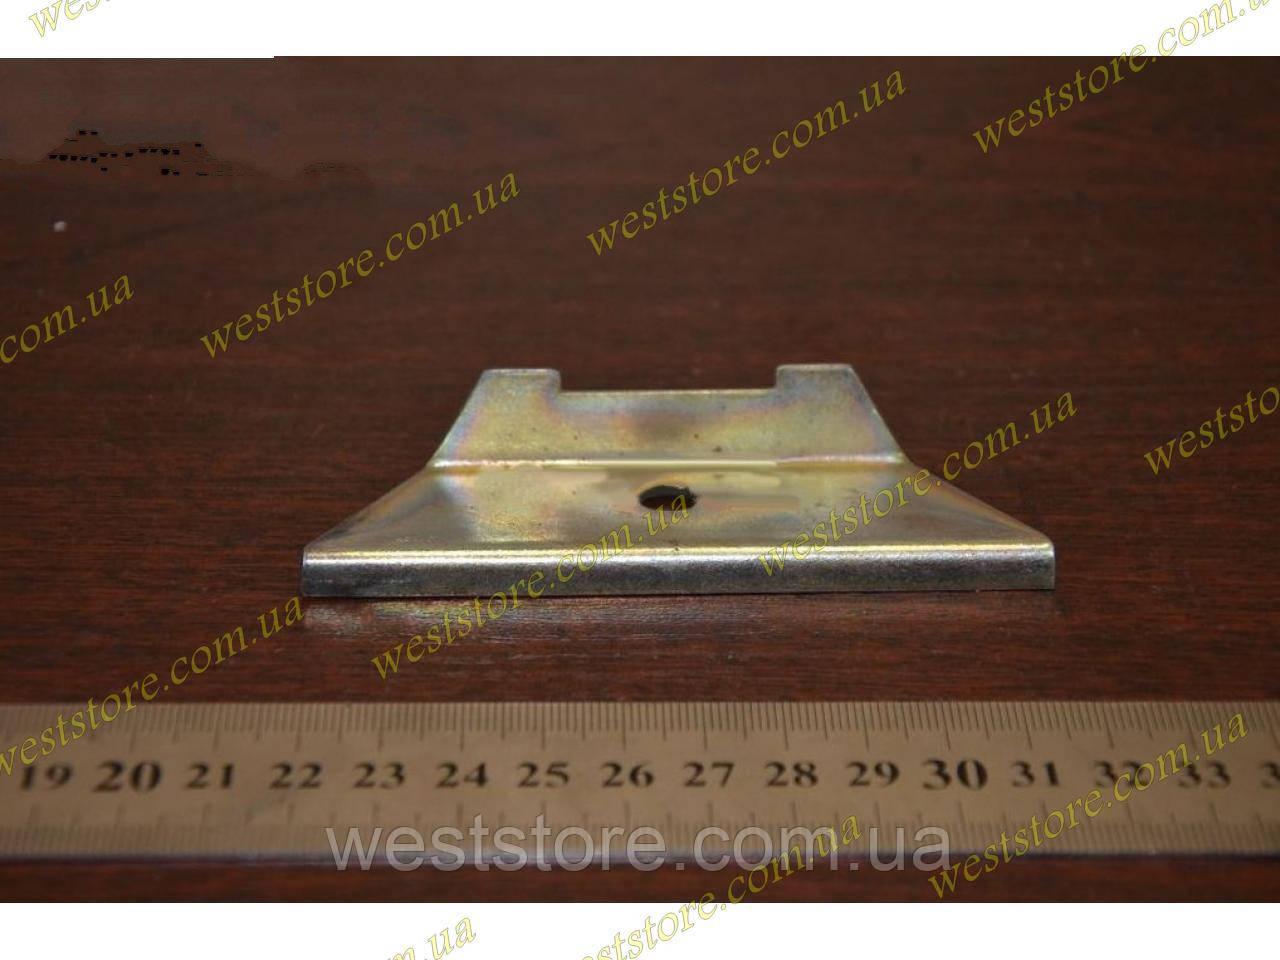 Крепление аккумулятора АКБ Ваз 2105 2107 (планка)